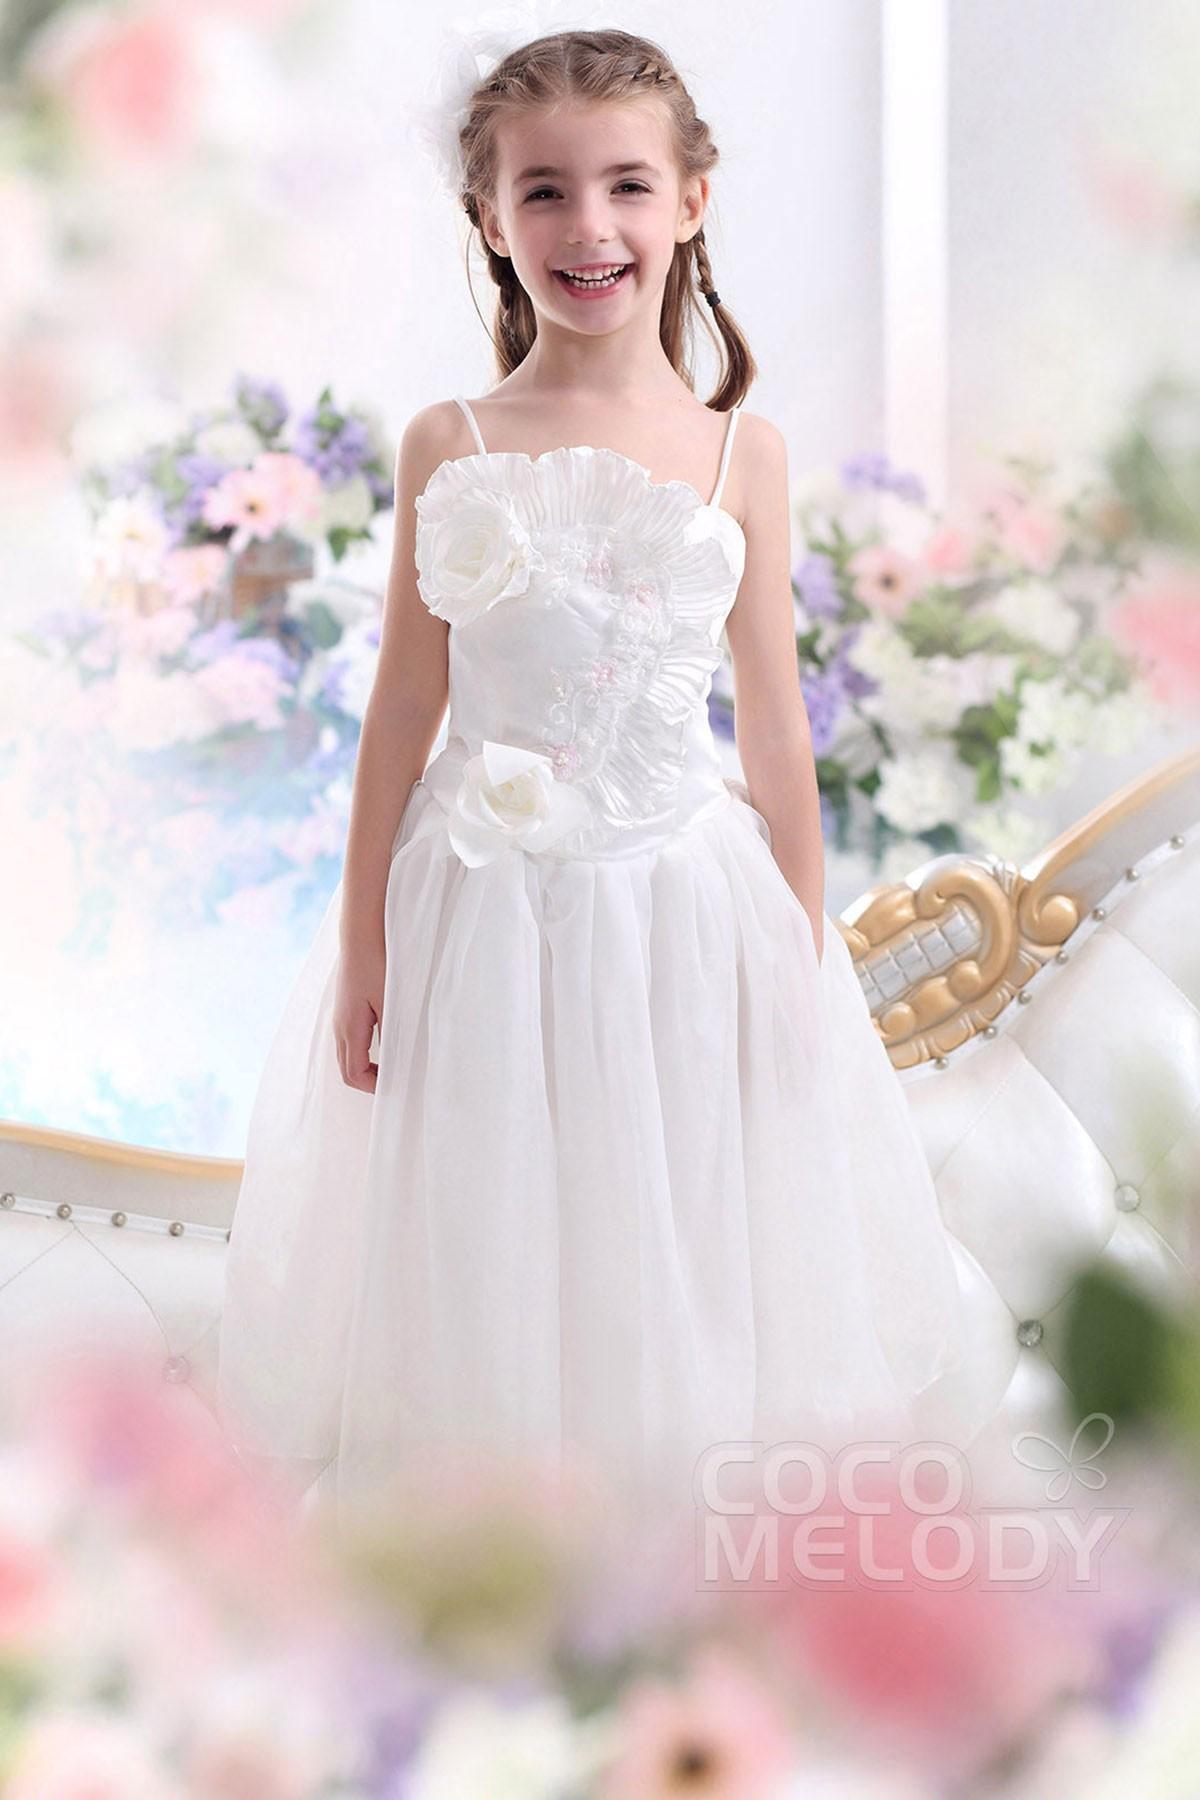 A Line Floor Length Organza Flower Girl Dress Ckza13005 Cocomelody